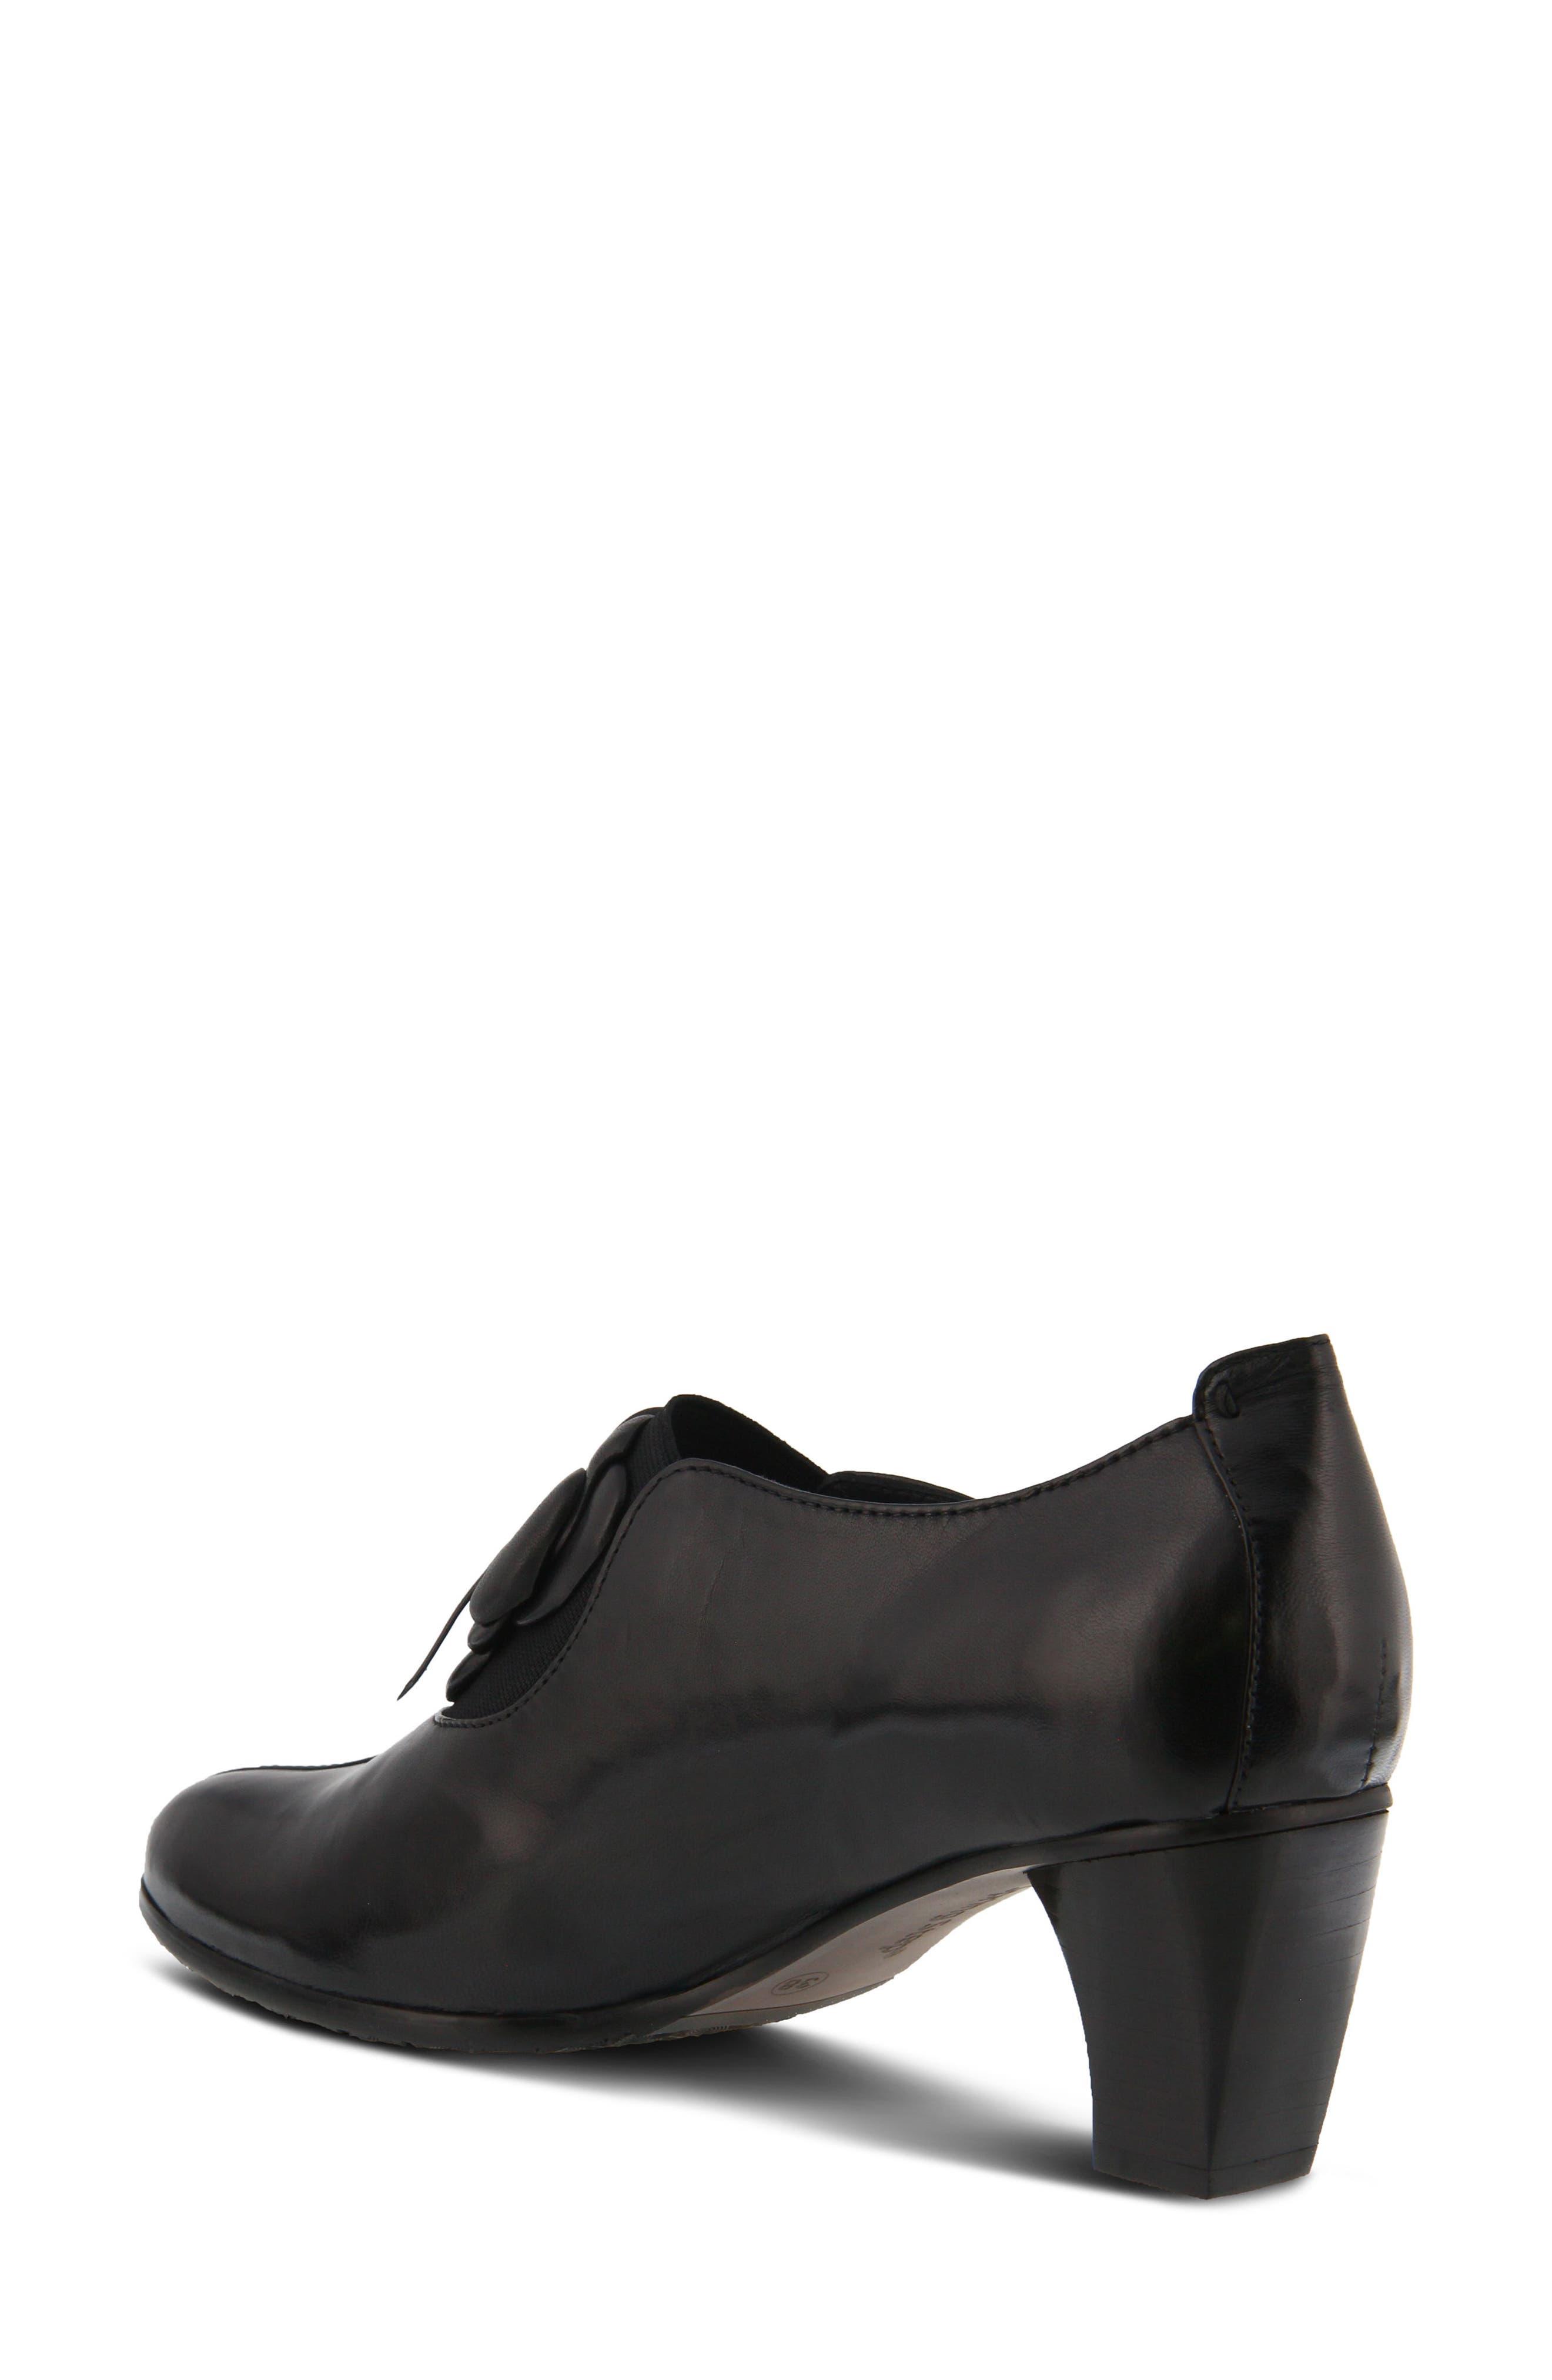 Evelina Pump,                             Alternate thumbnail 2, color,                             Black Leather